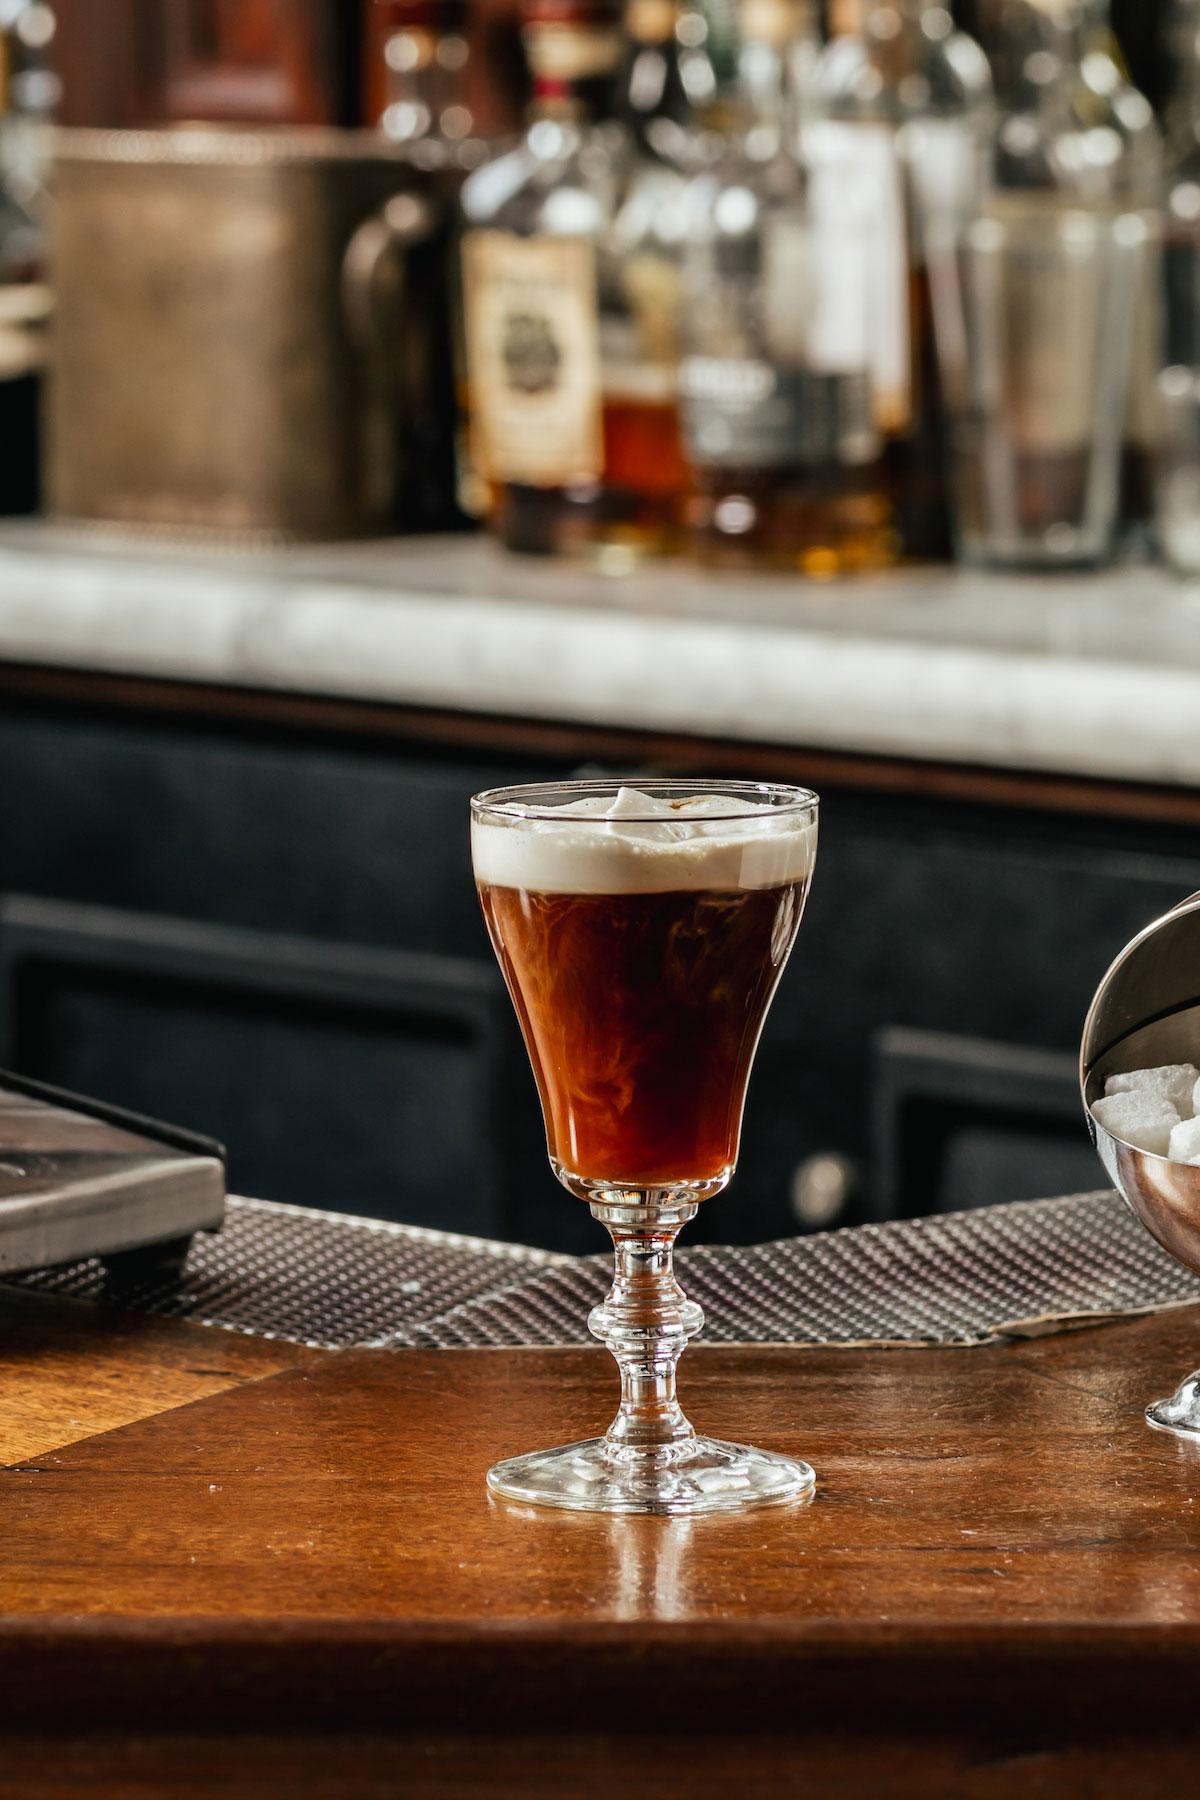 Raglin's Irish Coffee made with Mr. Espresso